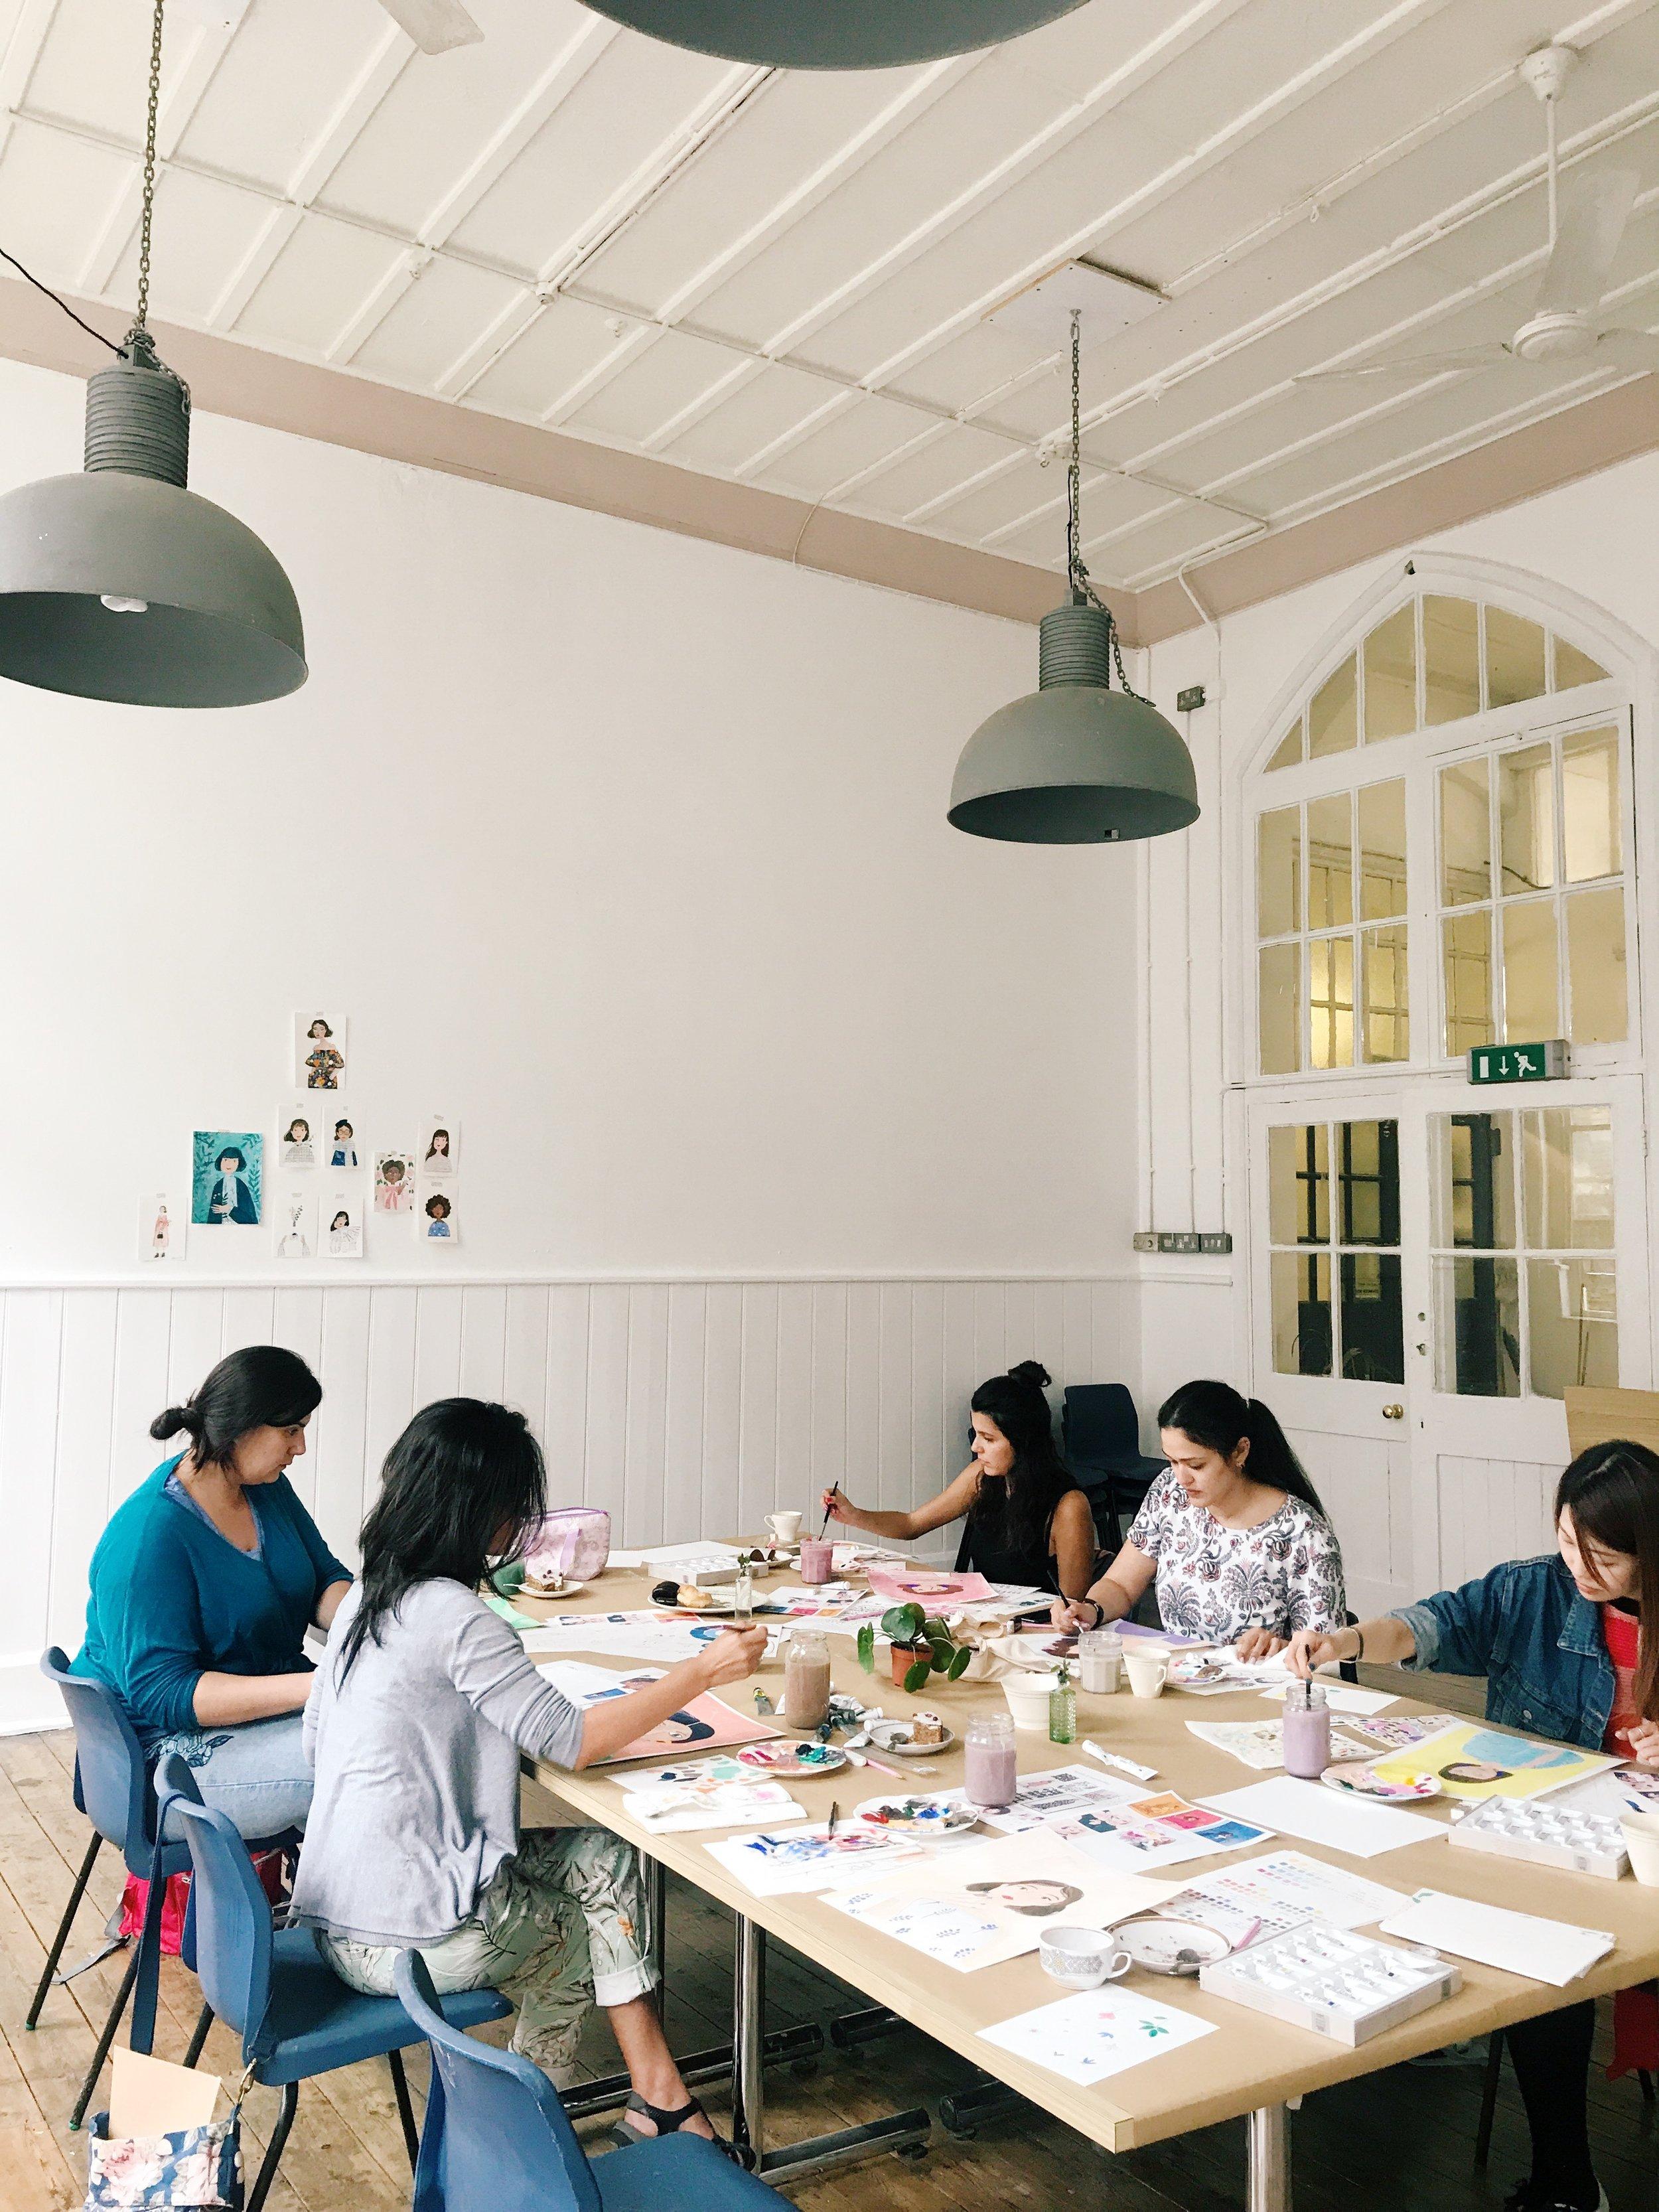 andsmilestudio portrait painting workshop